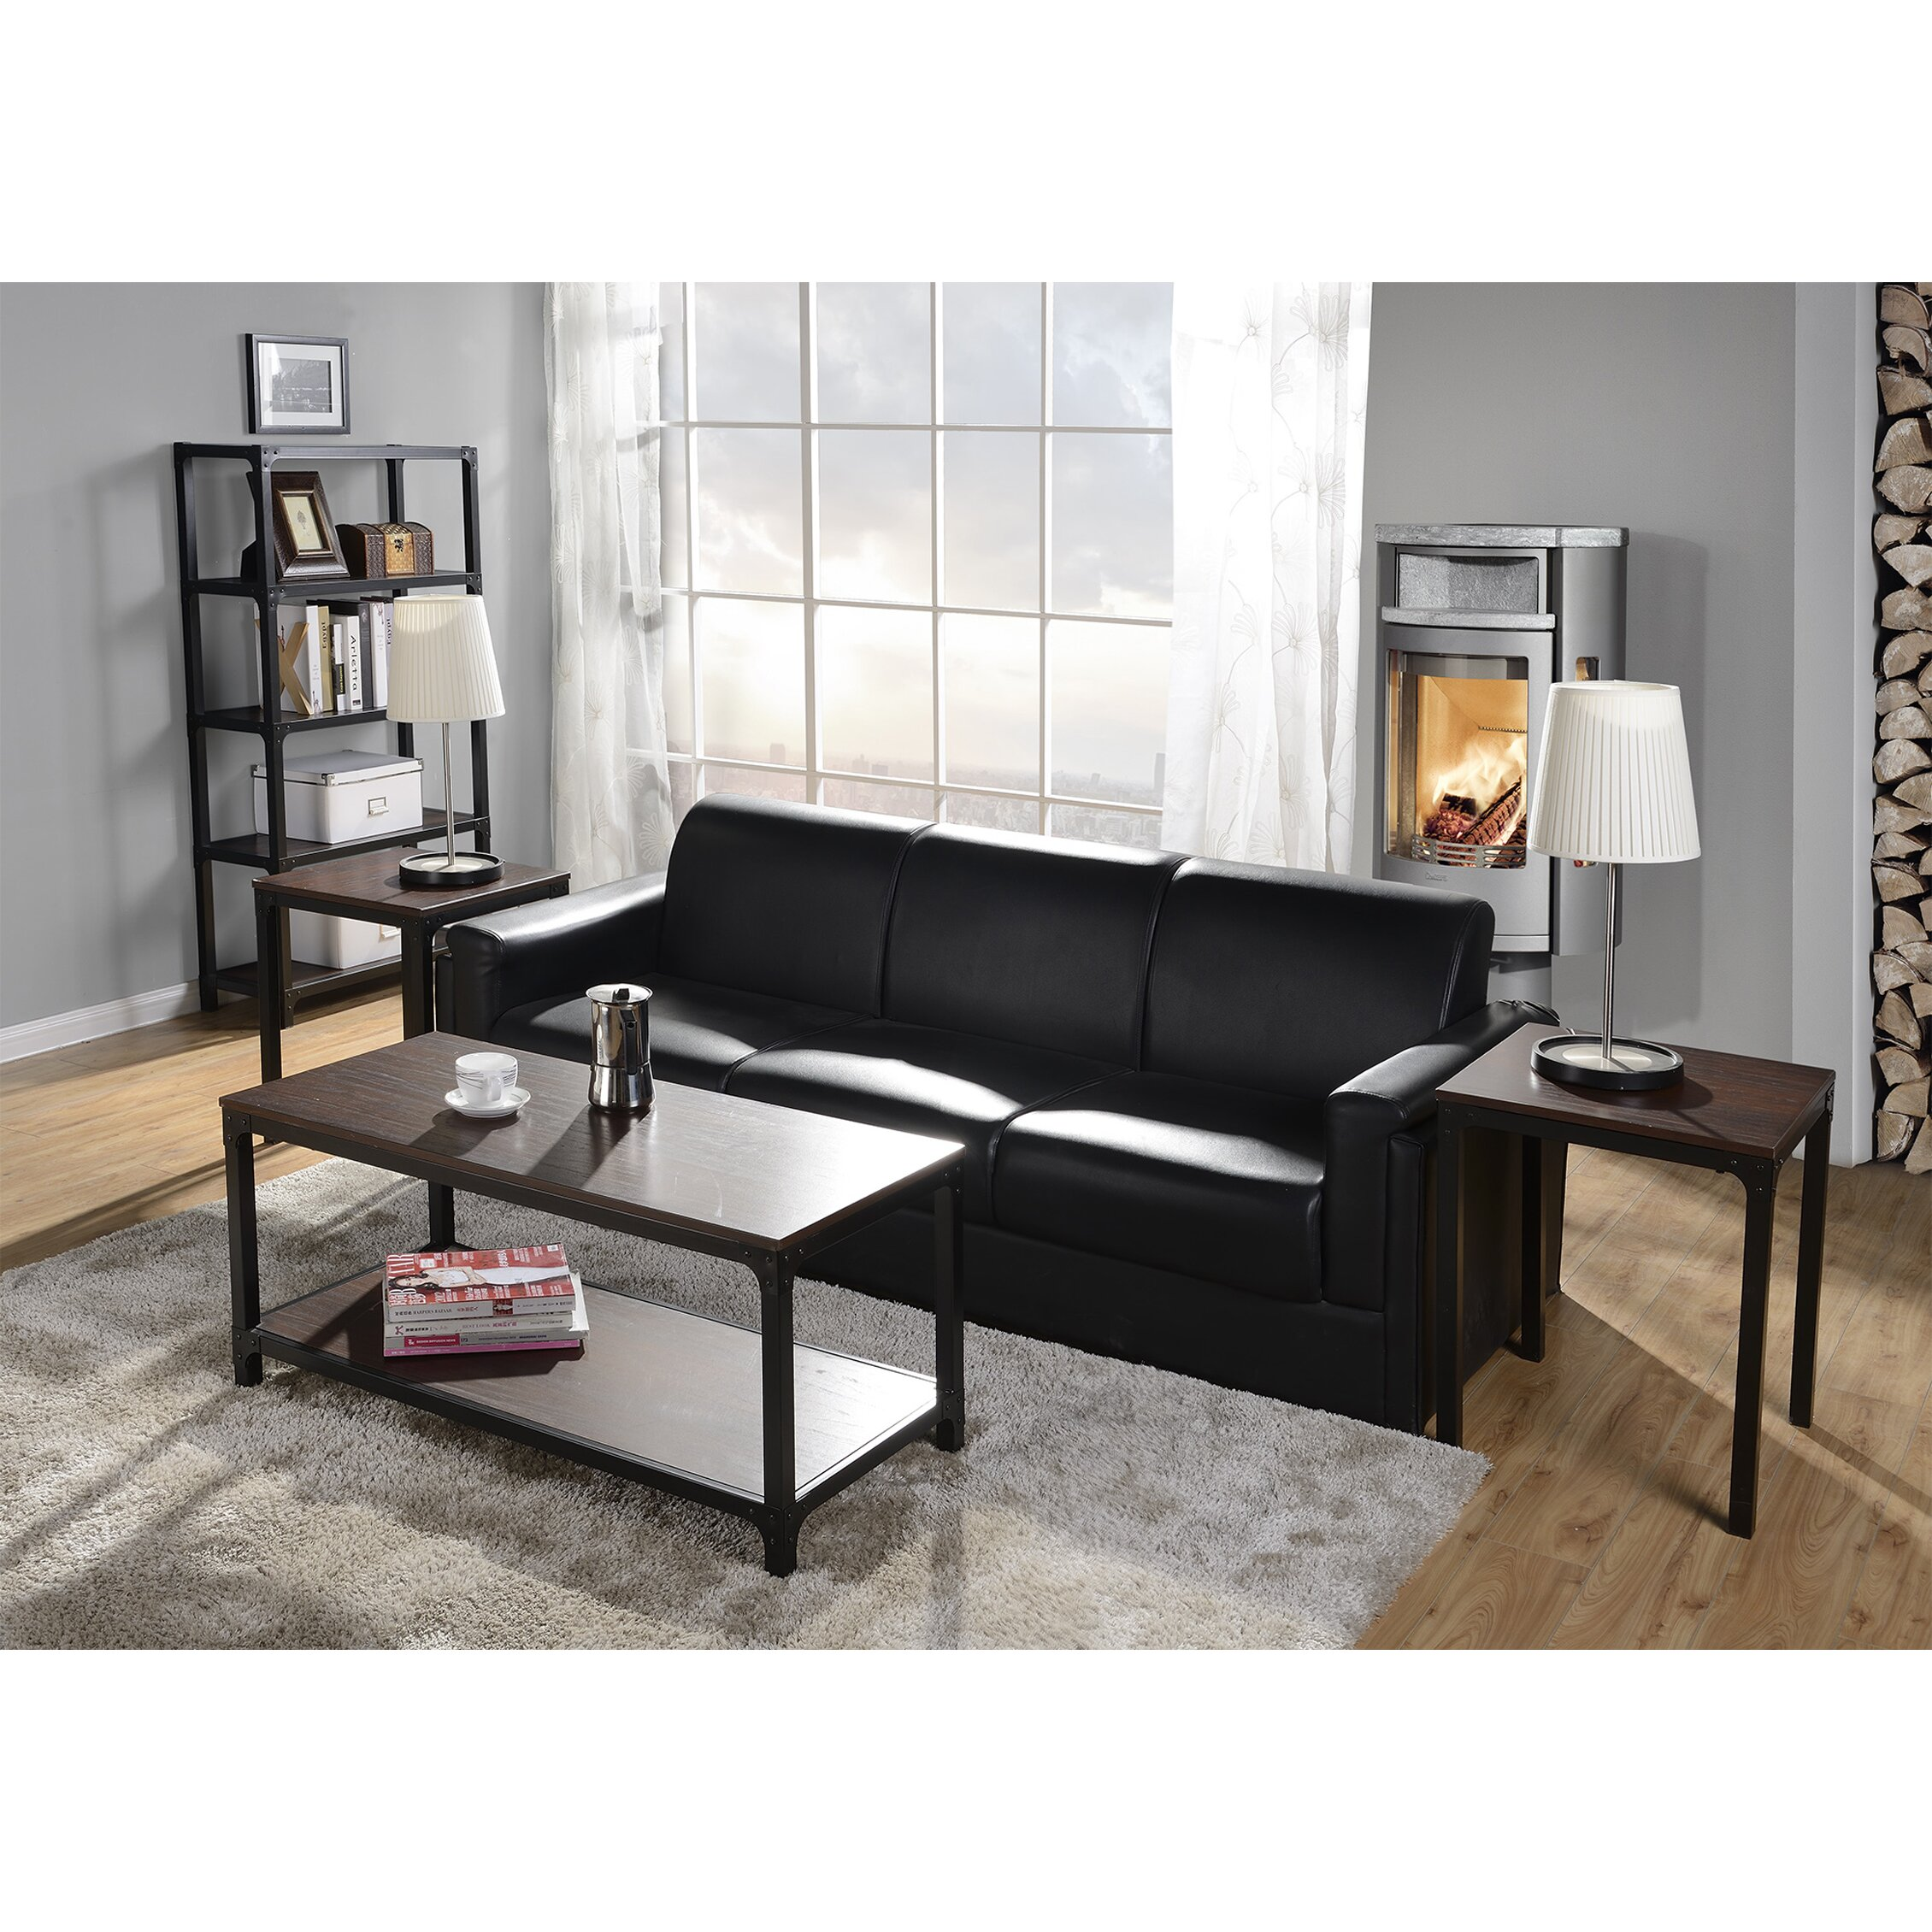 Coffee Table Set Of 3 Homestar 3 Piece Coffee Table Set Reviews Wayfair